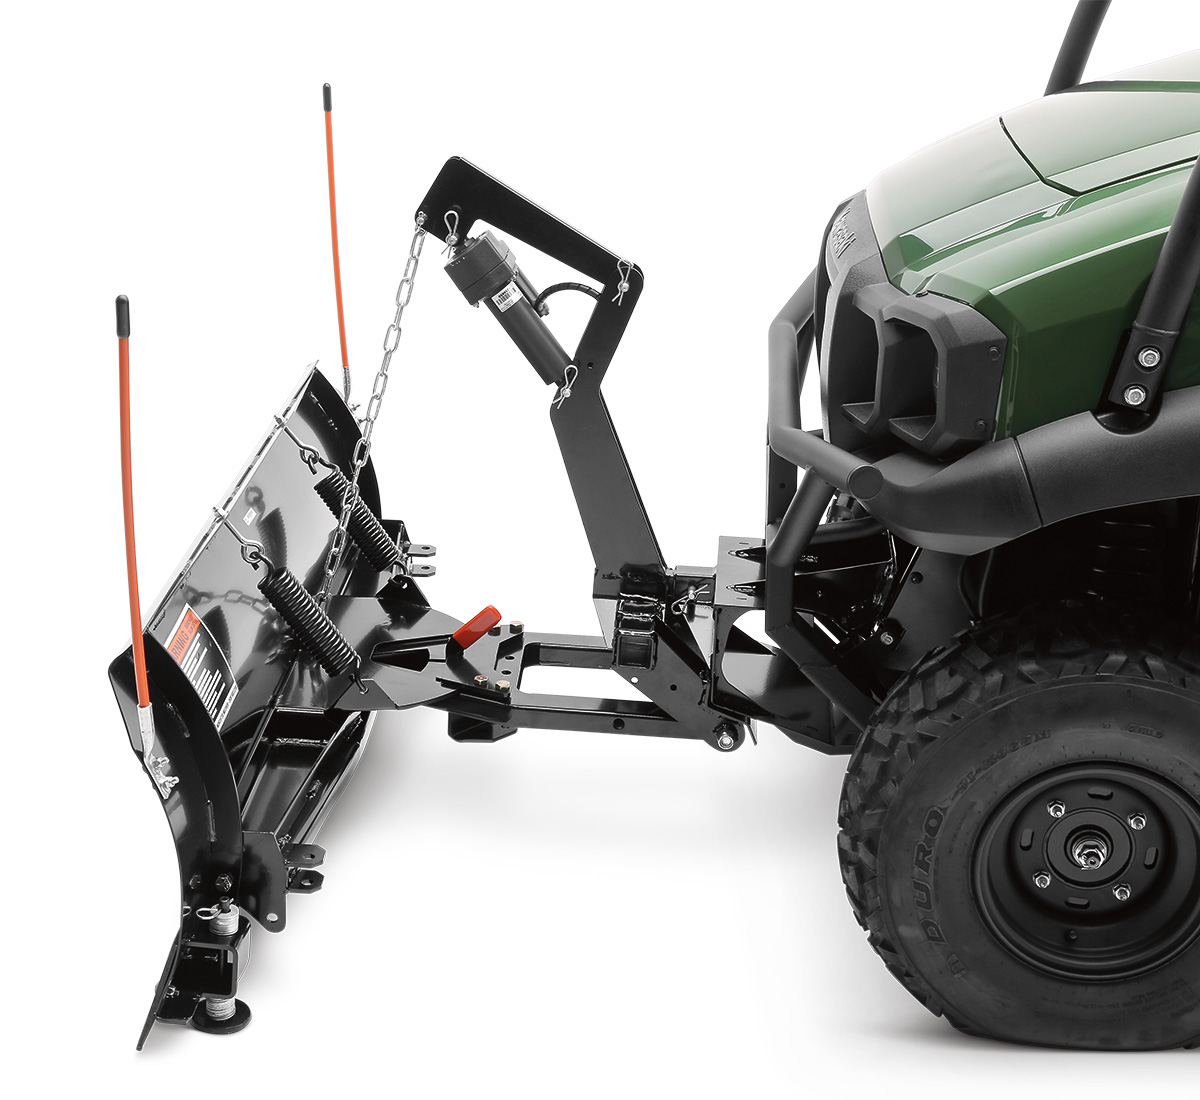 Kawasaki Mule 2510 Plow Wiring Diagram Side 1200x1100